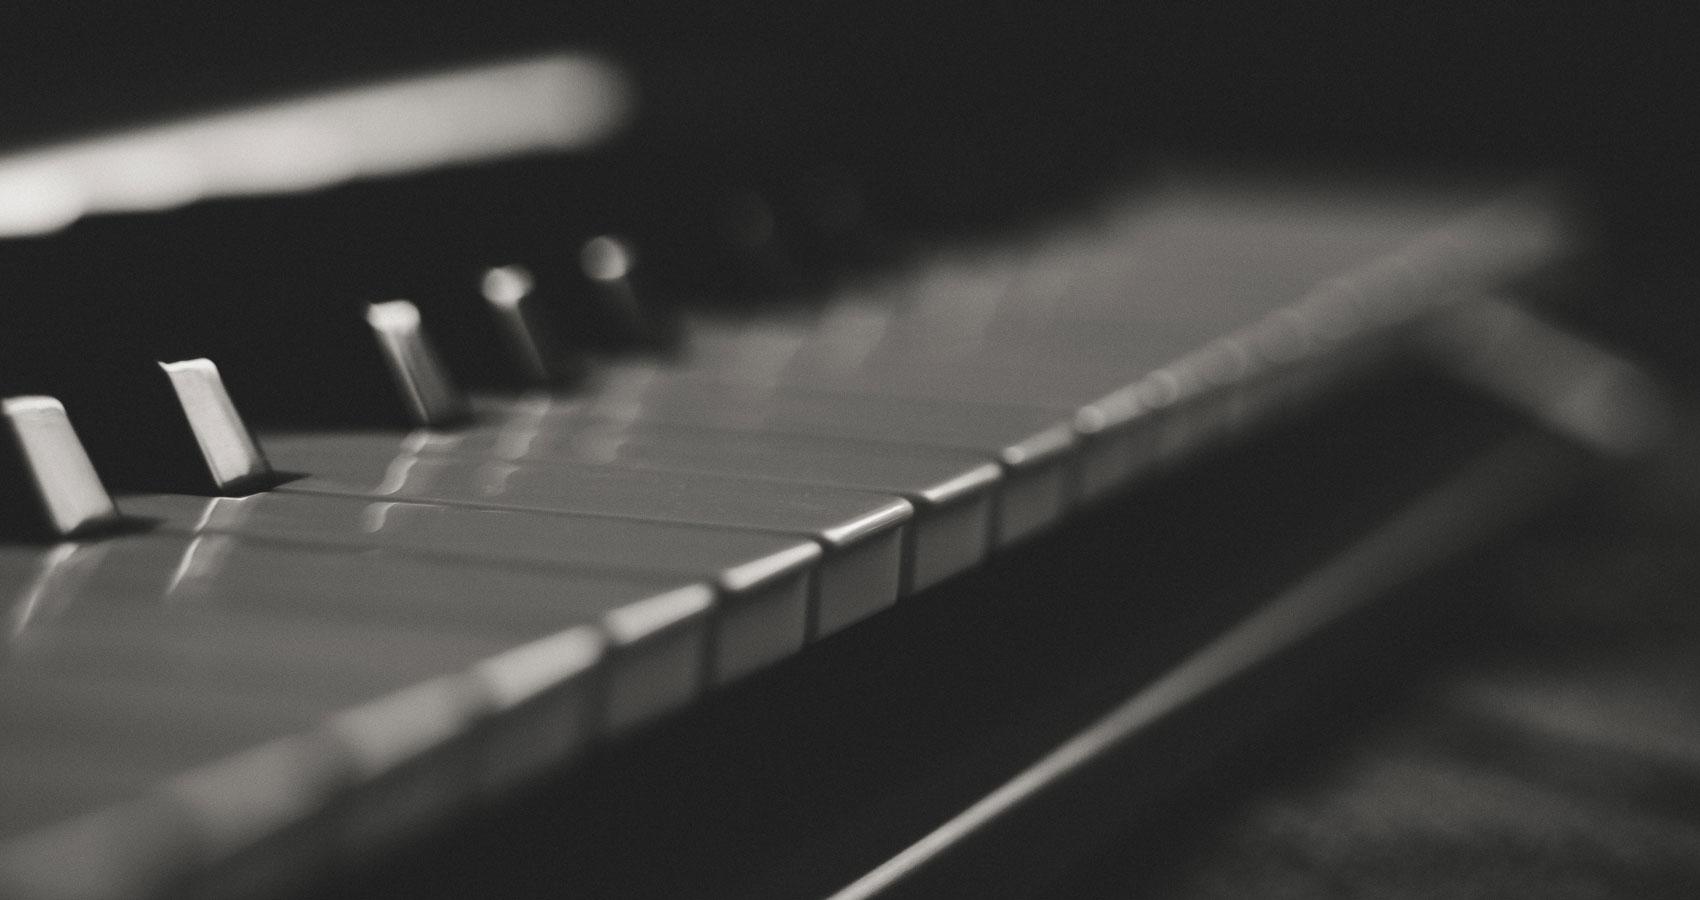 Background Music, written by Dan Leicht at Spillwords.com